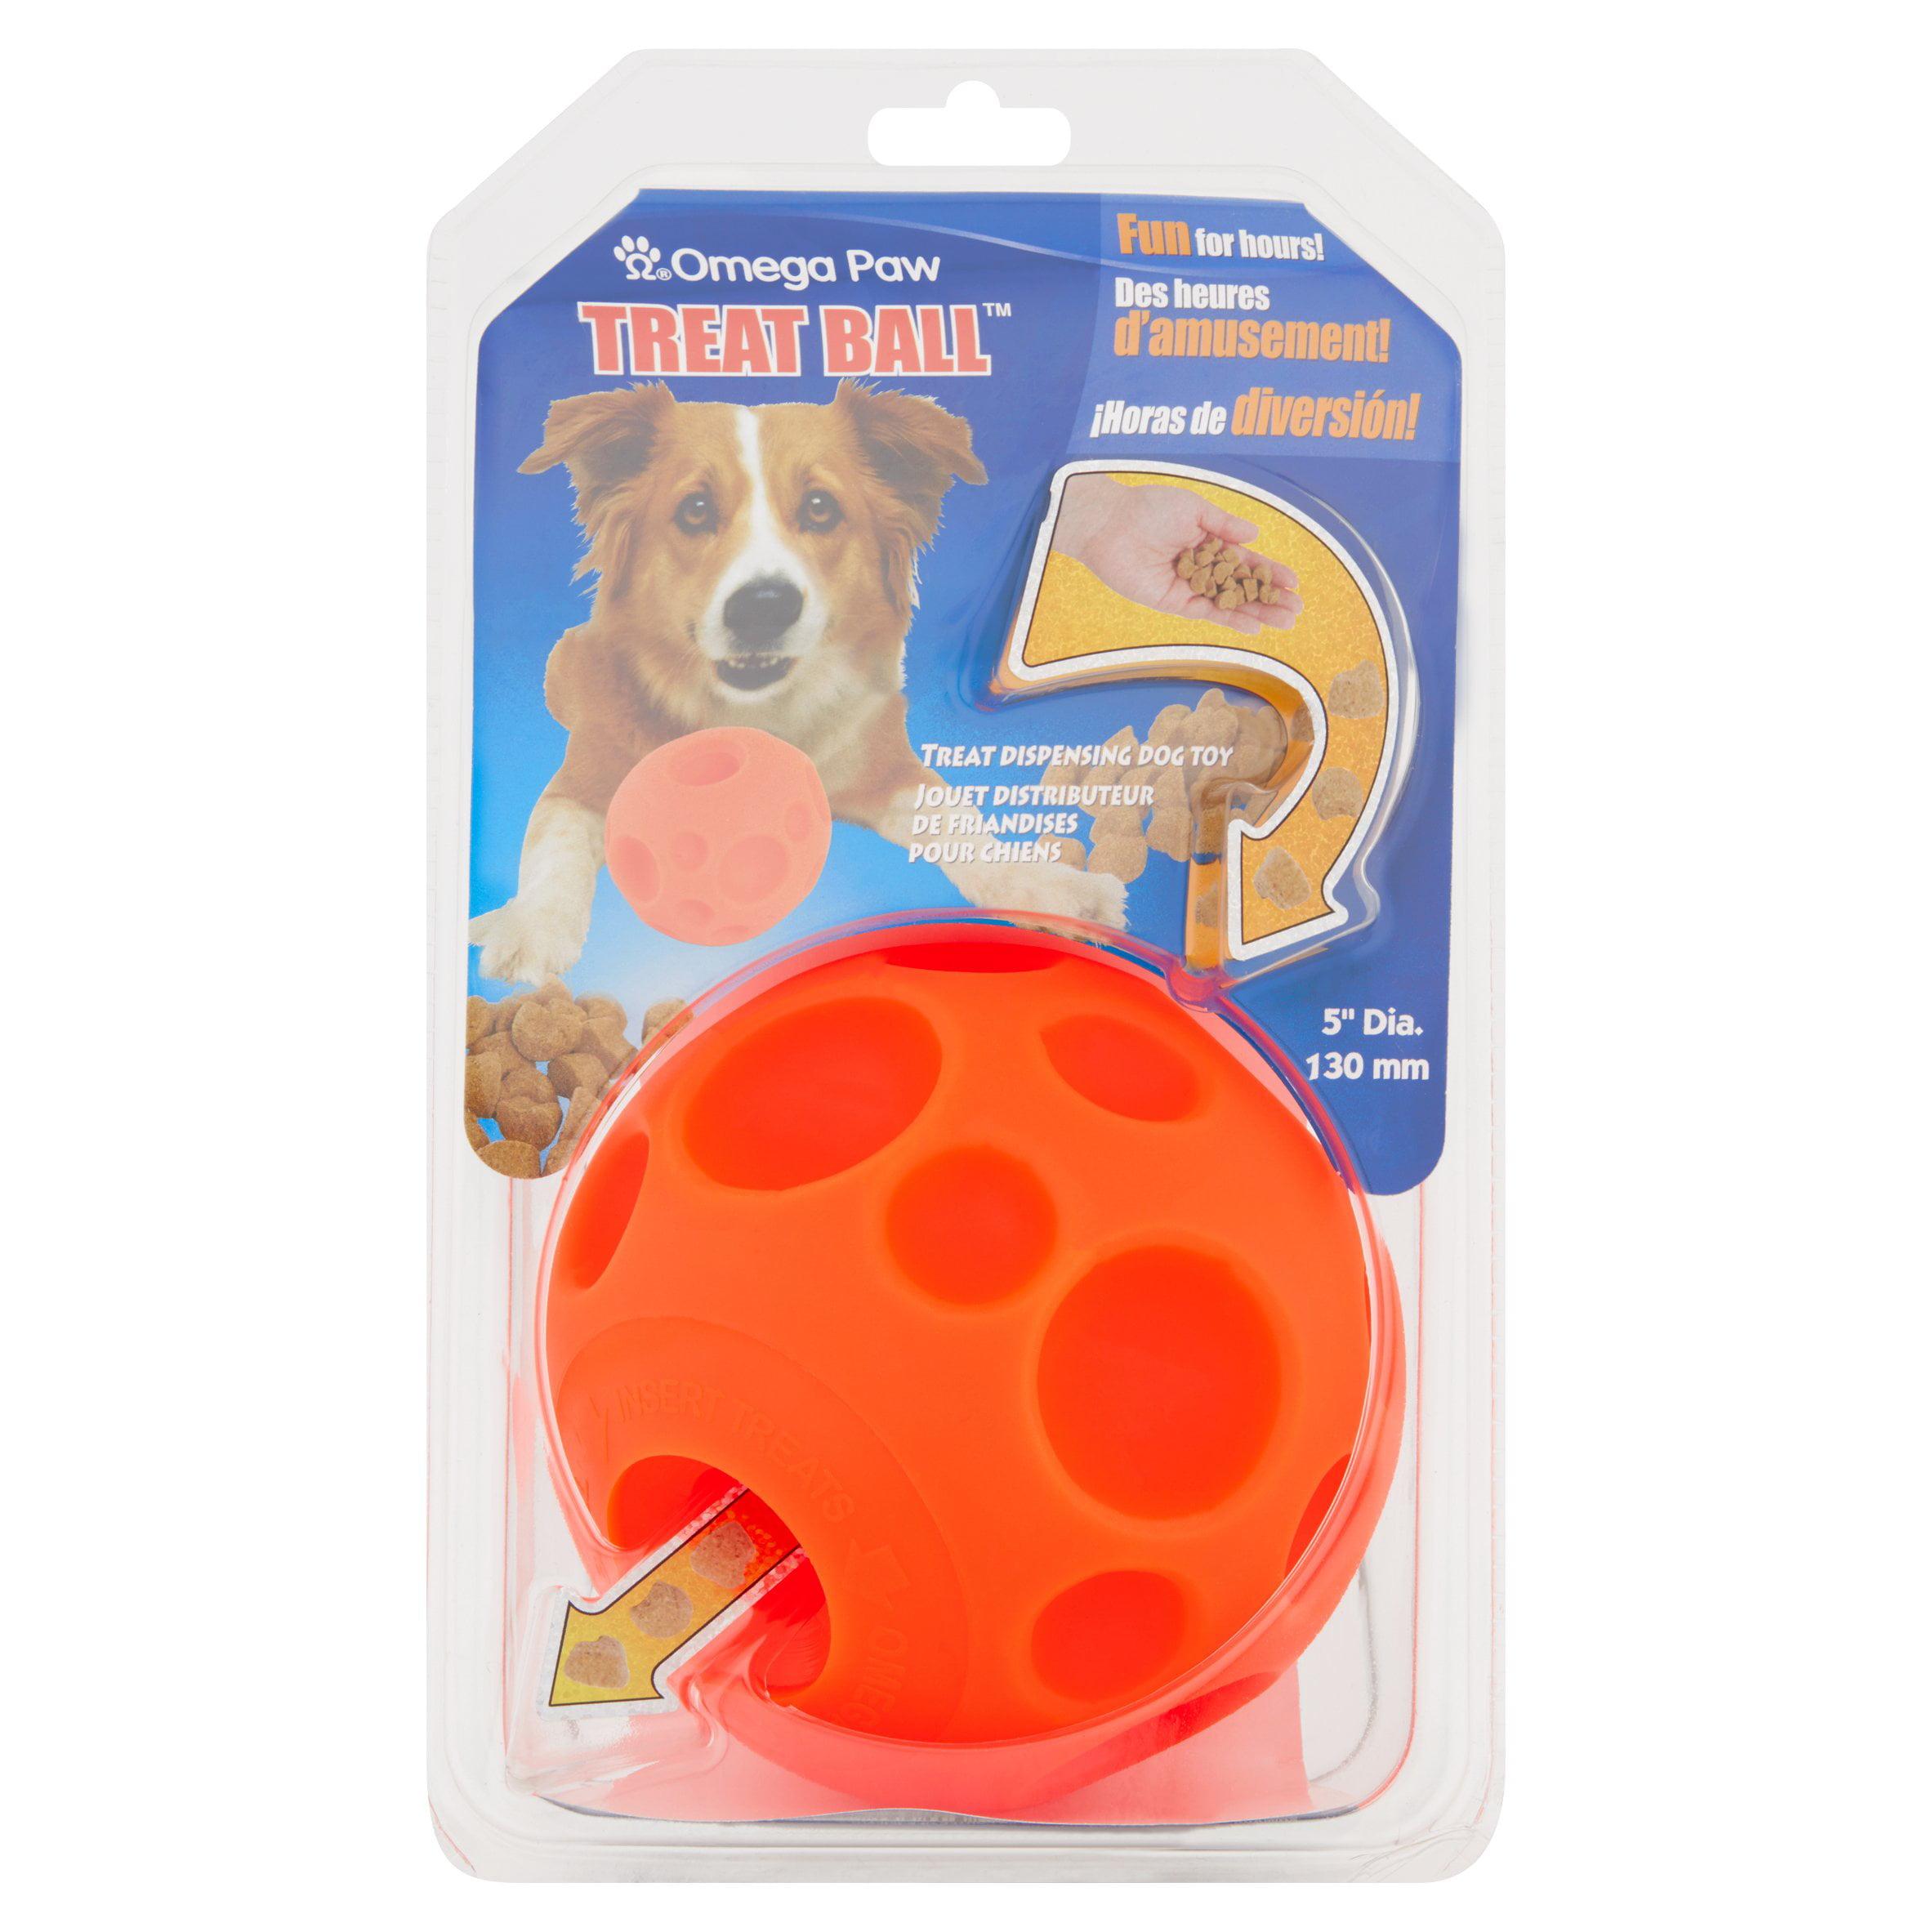 Omega Paw Treat Ball Treat Dispensing Dog Toy